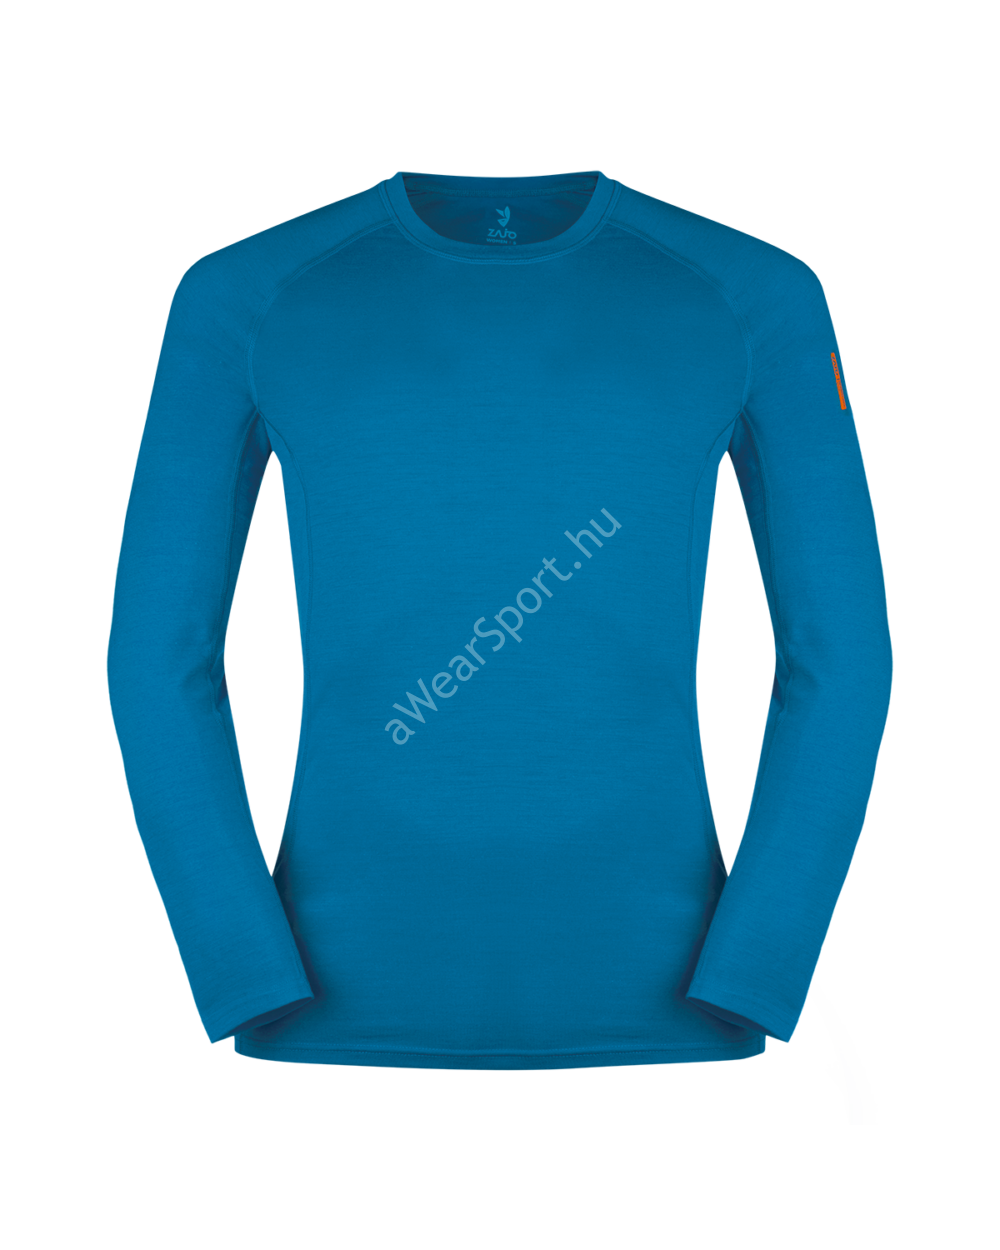 Zajo Bjorn Merino Tshirt LS férfi merinói gyapjú aláöltözet felső, greek blue